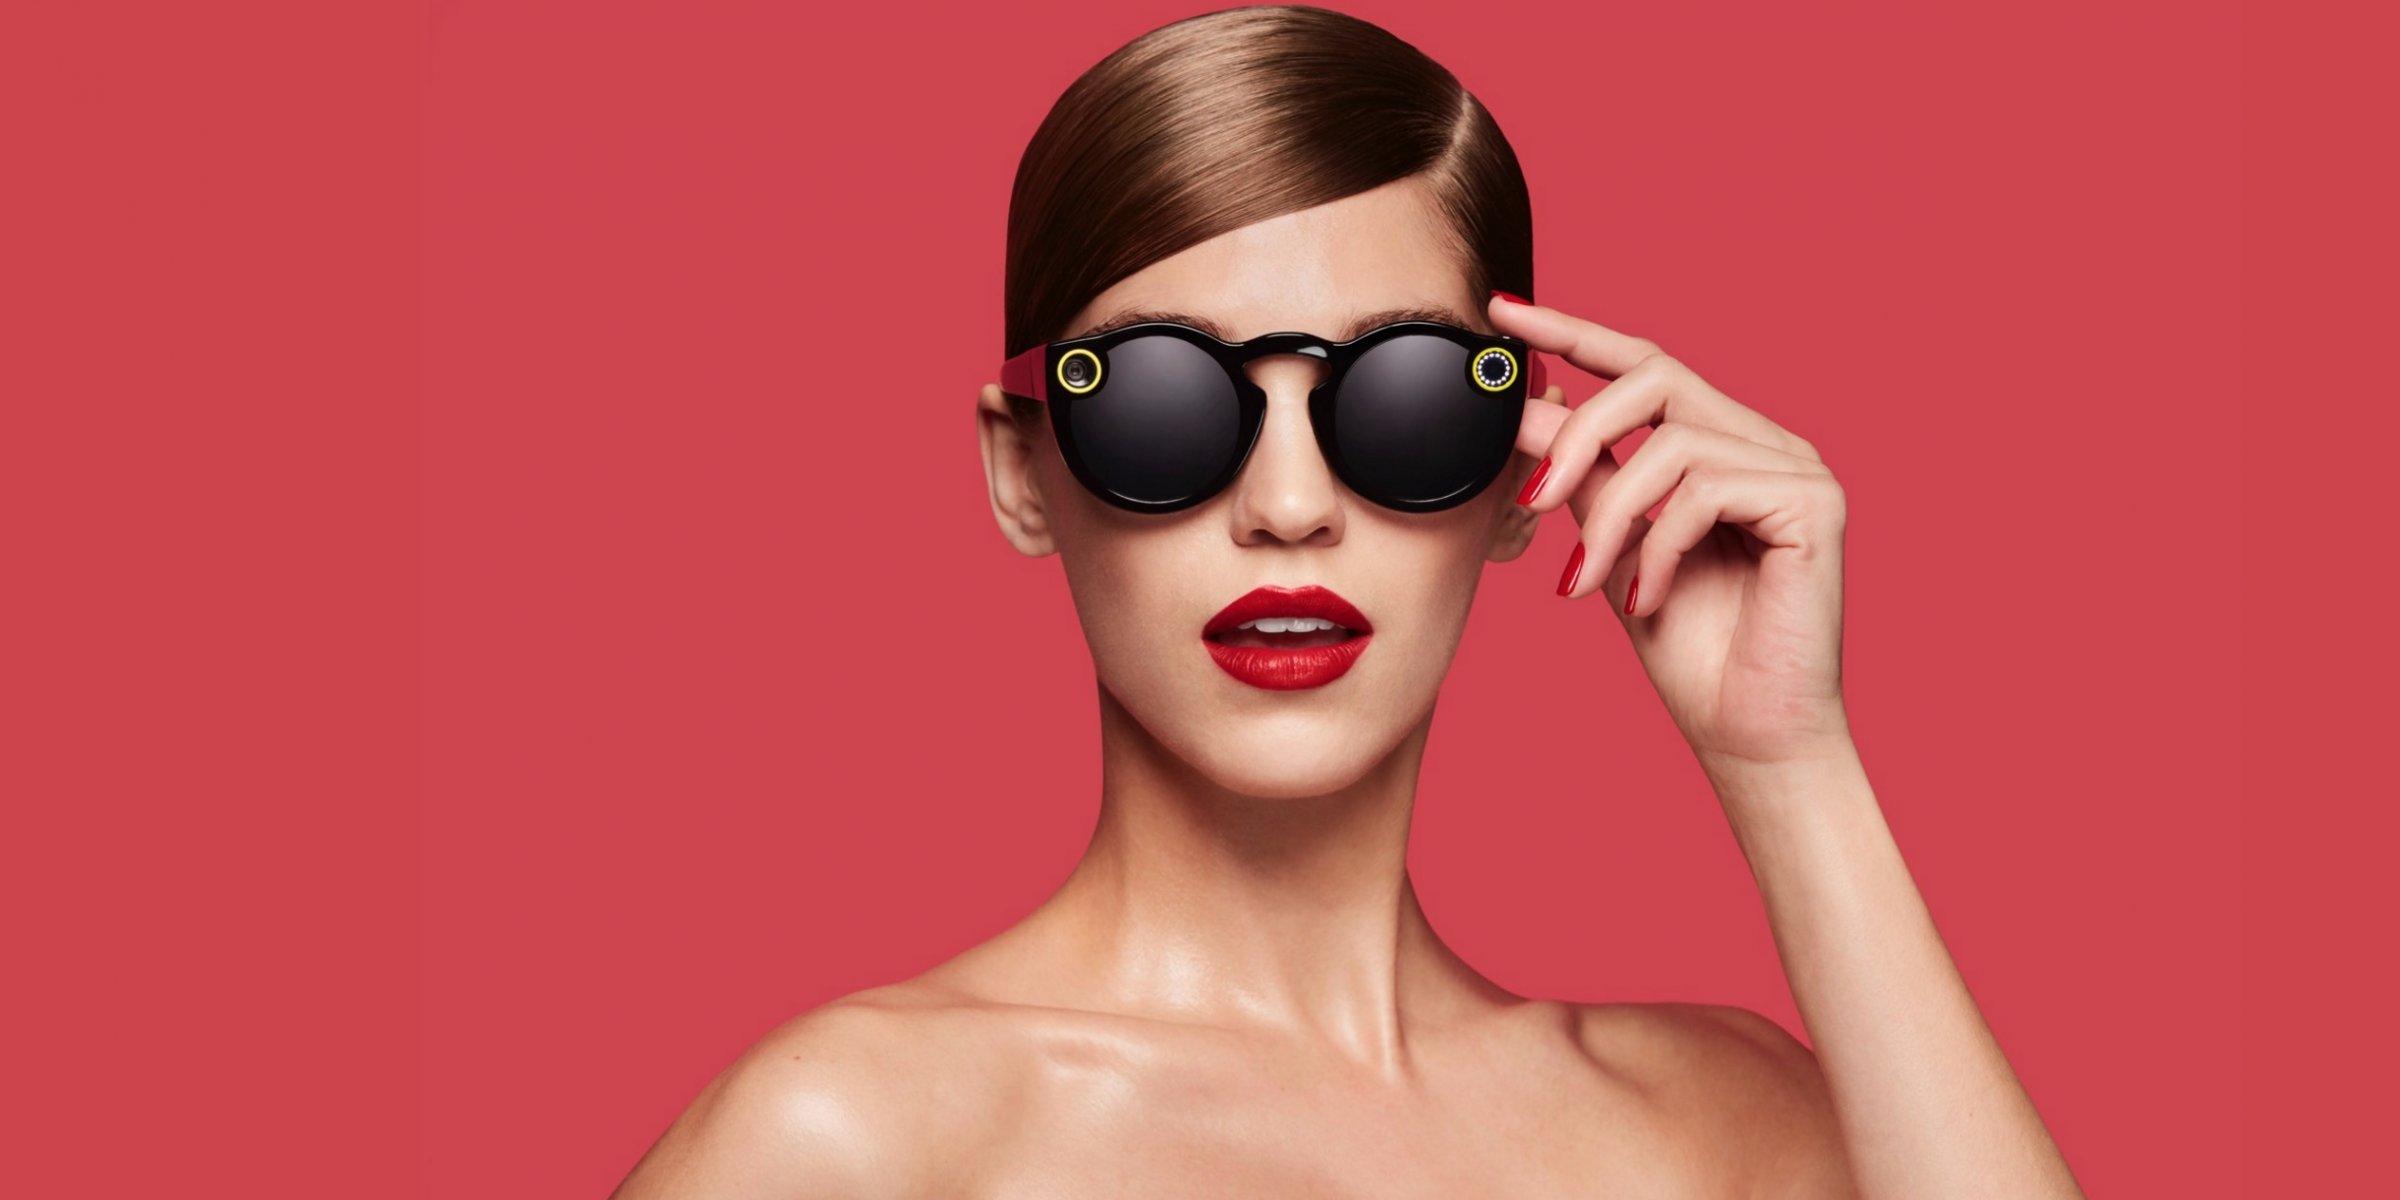 https: img.okezone.com content 2016 11 07 207 1534960 tiga-faktor-keberhasilan-snap-spectacles-dibanding-google-glass-CzwEVXRob2.jpg